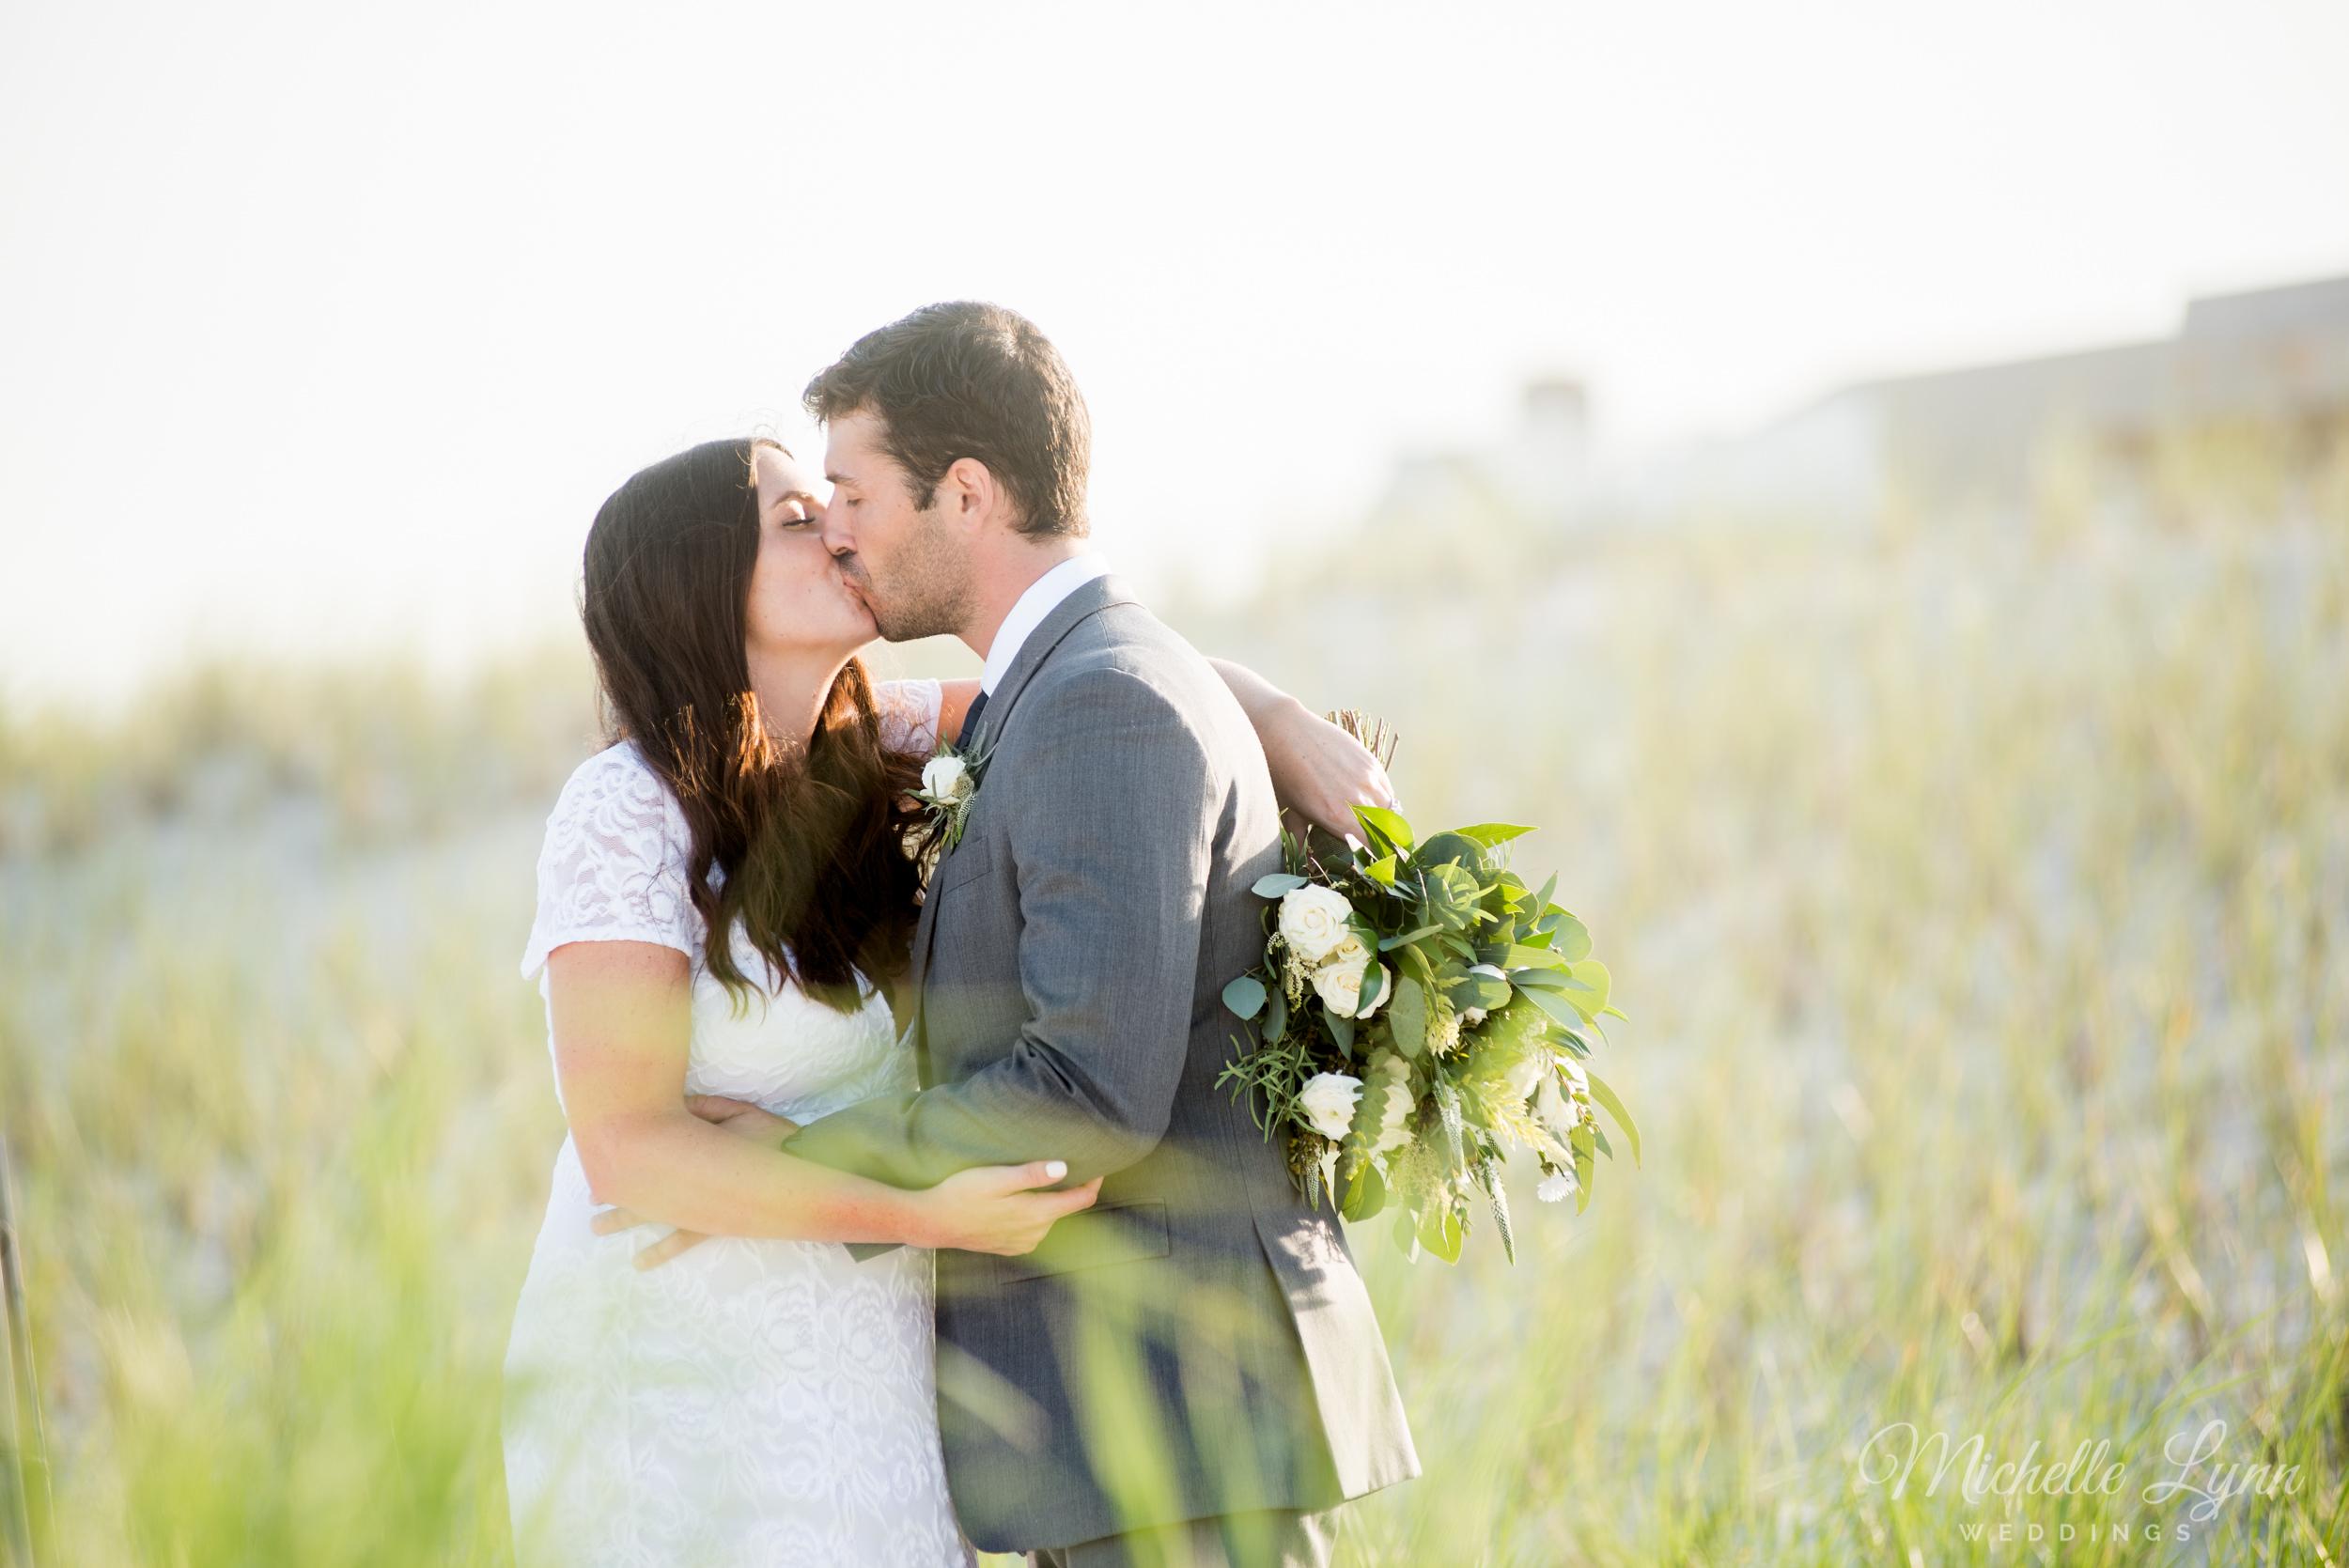 mlw-long-beach-island-new-jersey-wedding-photography-27.jpg